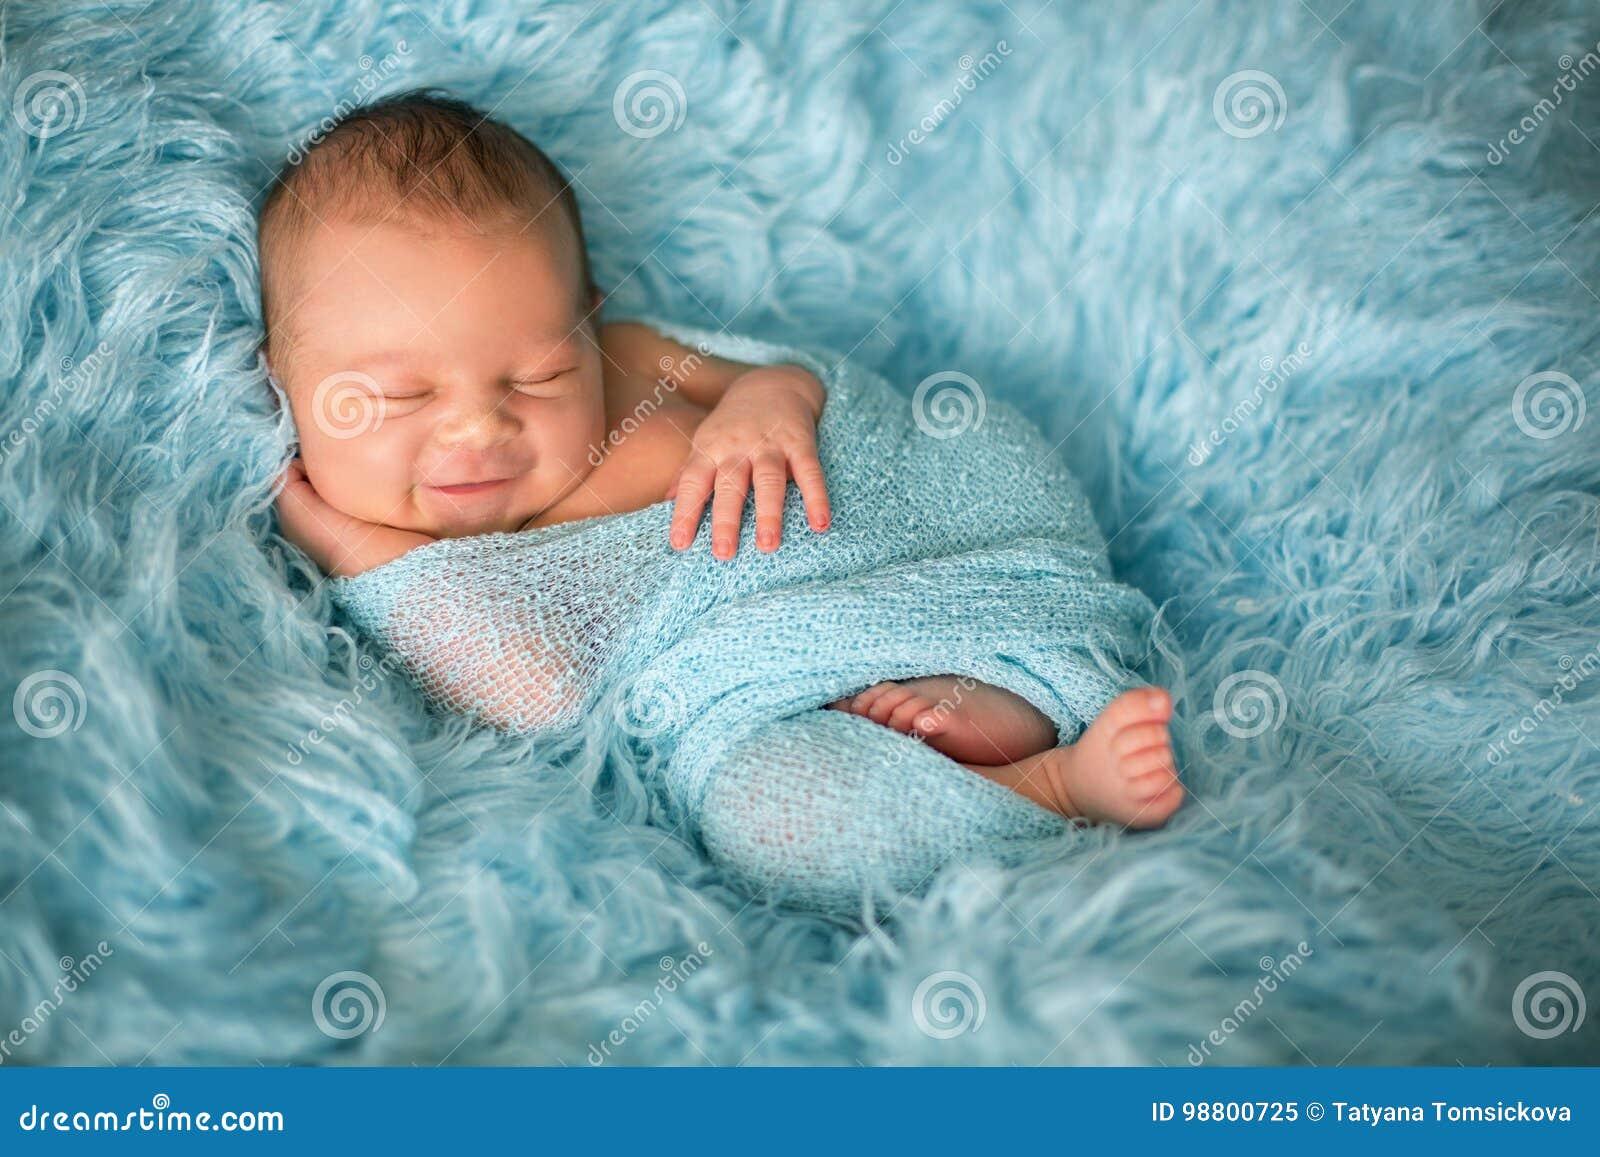 a1f450e4c4b Happy Smiling Newborn Baby In Wrap